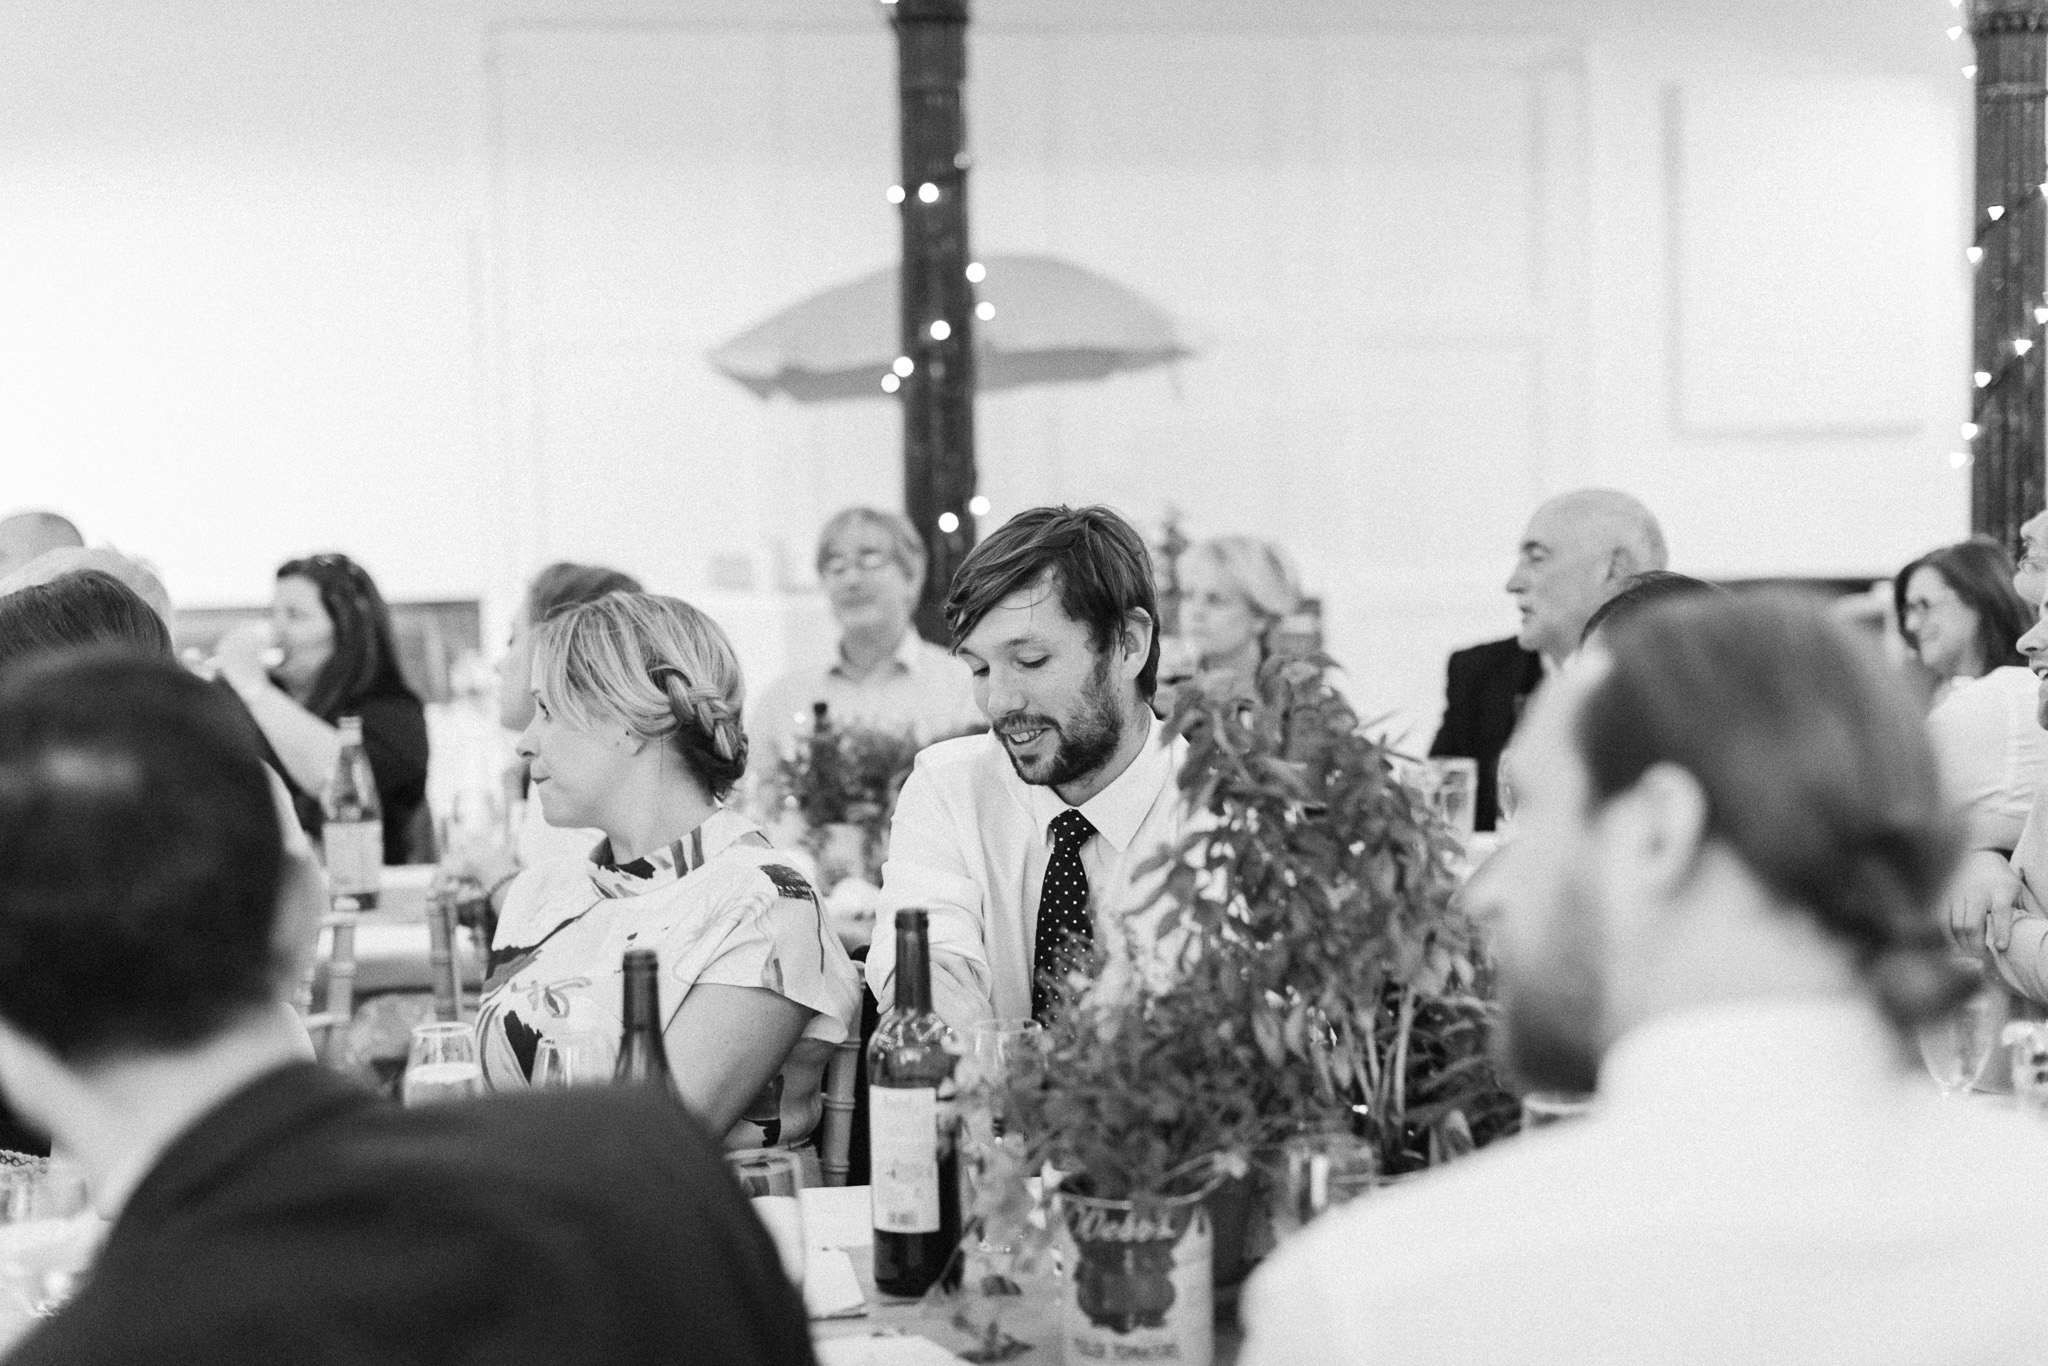 st_andrews_fabrica_brighton_wedding_618.jpg